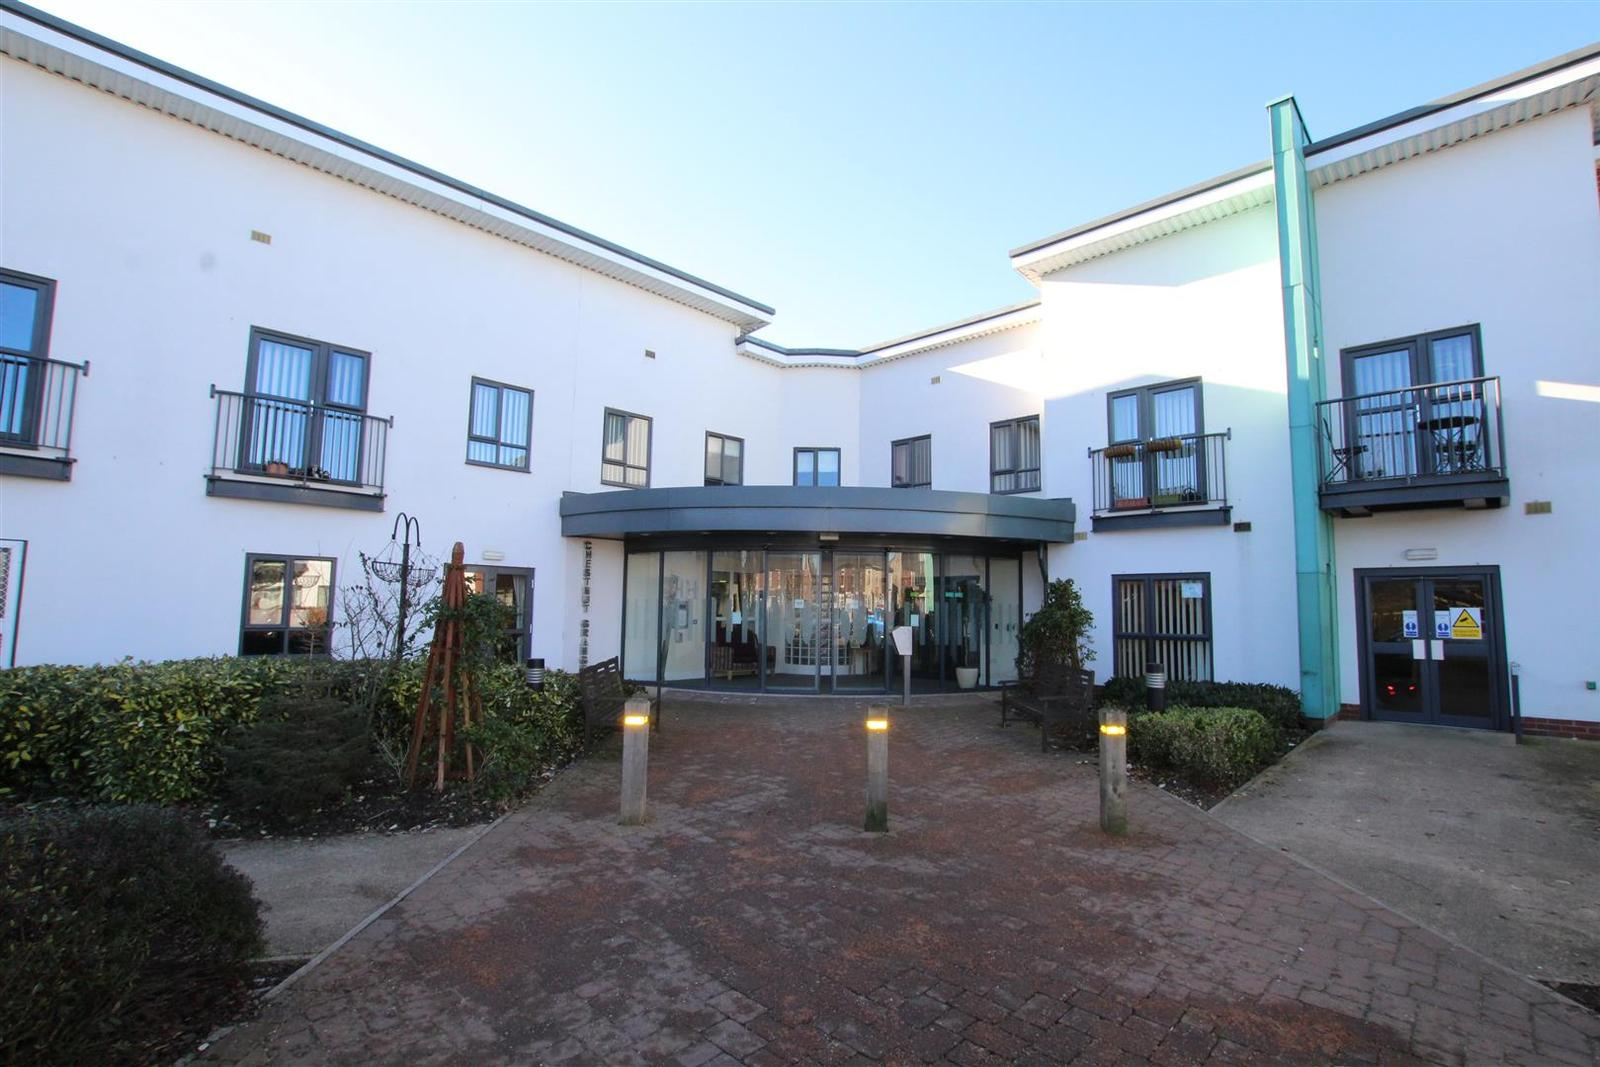 2 Bedrooms Property for sale in Chestnut Grange, Burton